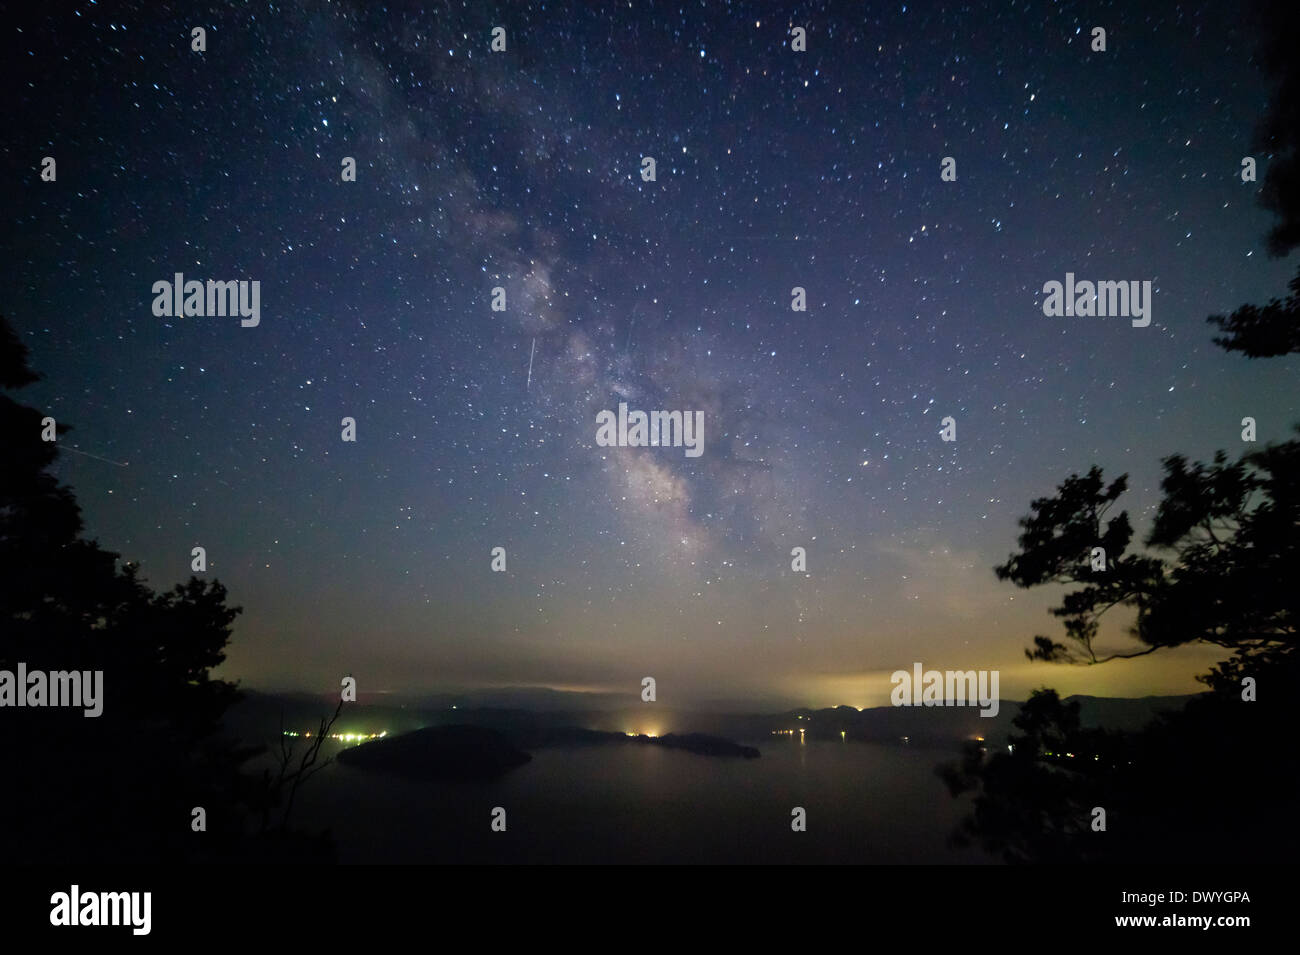 Night Sky Filled with Stars, Lake Towada, Towada, Aomori Prefecture, Japan - Stock Image